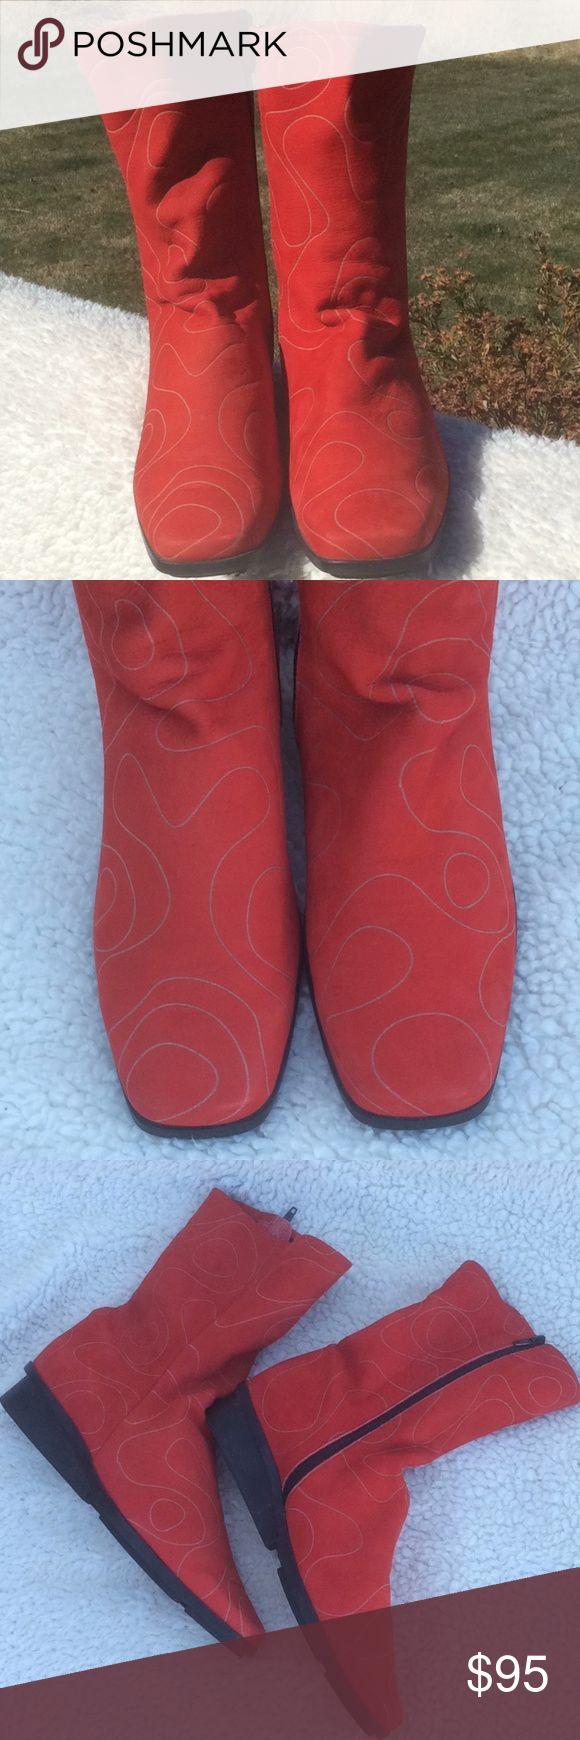 Arche Red Suede Zip Up Boots W/Swirl Design Sz 7.5 Unique